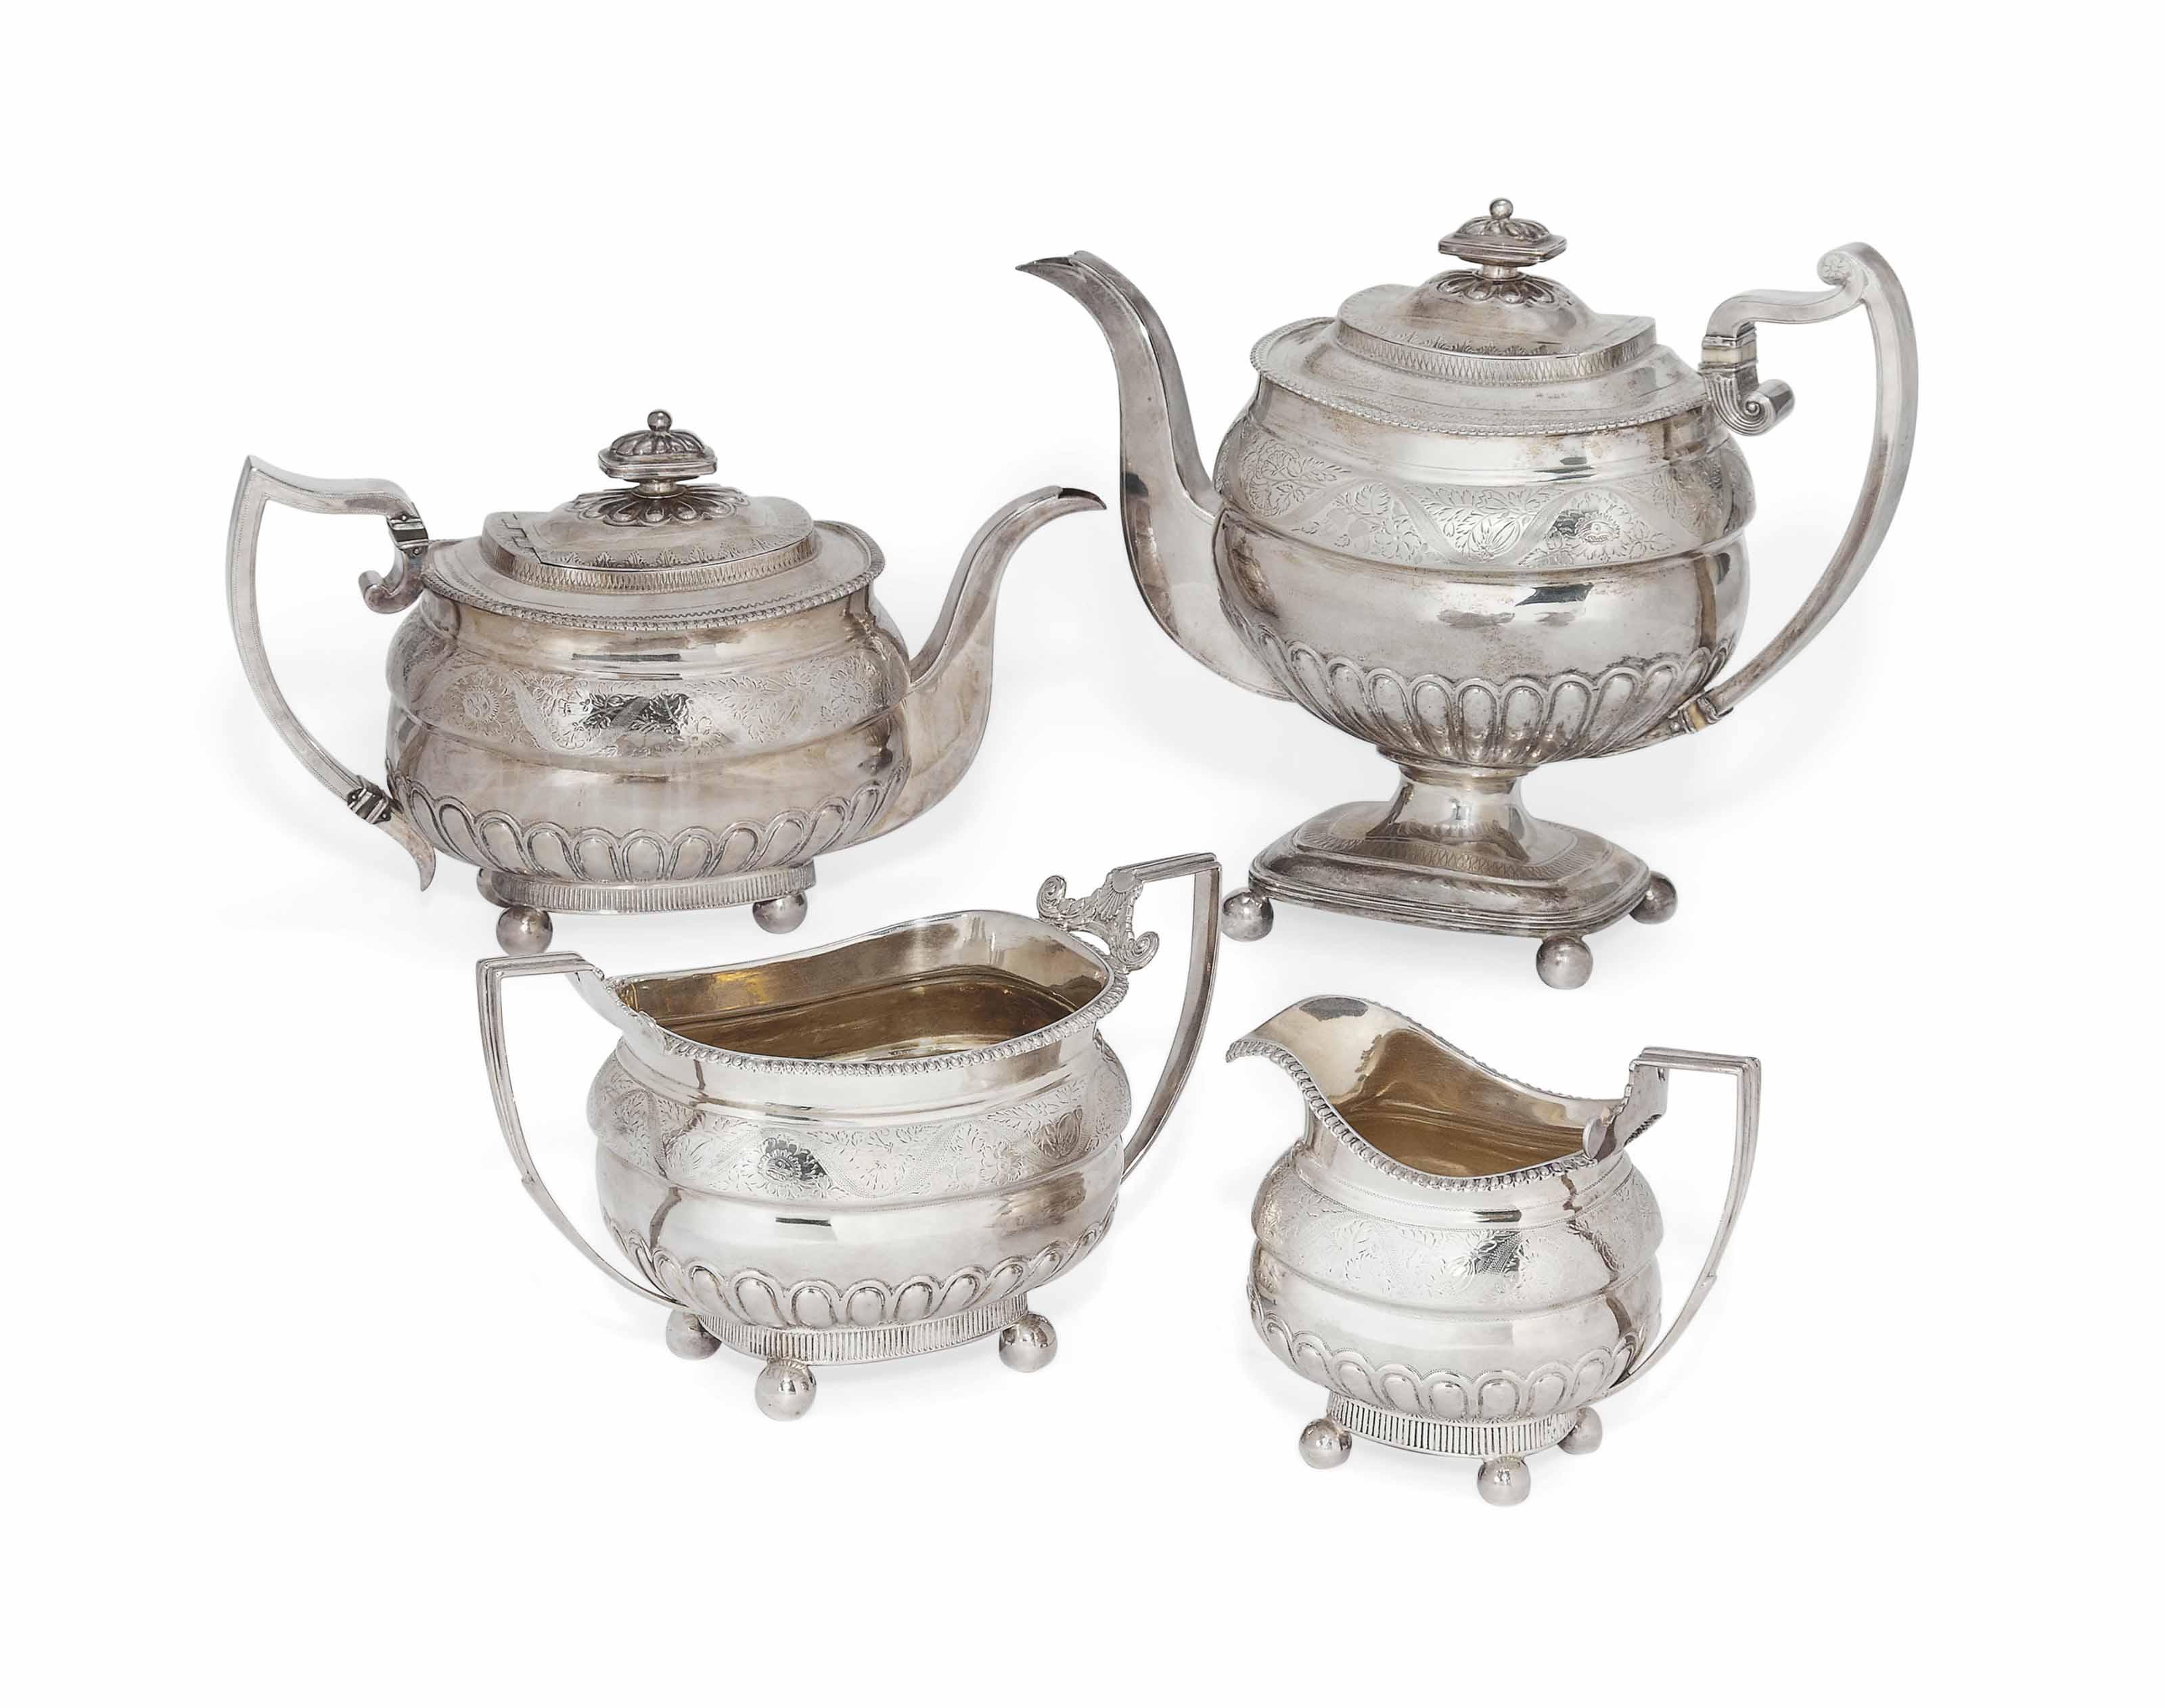 A GEORGE III PROVINCIAL SILVER FOUR-PIECE TEA AND COFFEE SERVICE